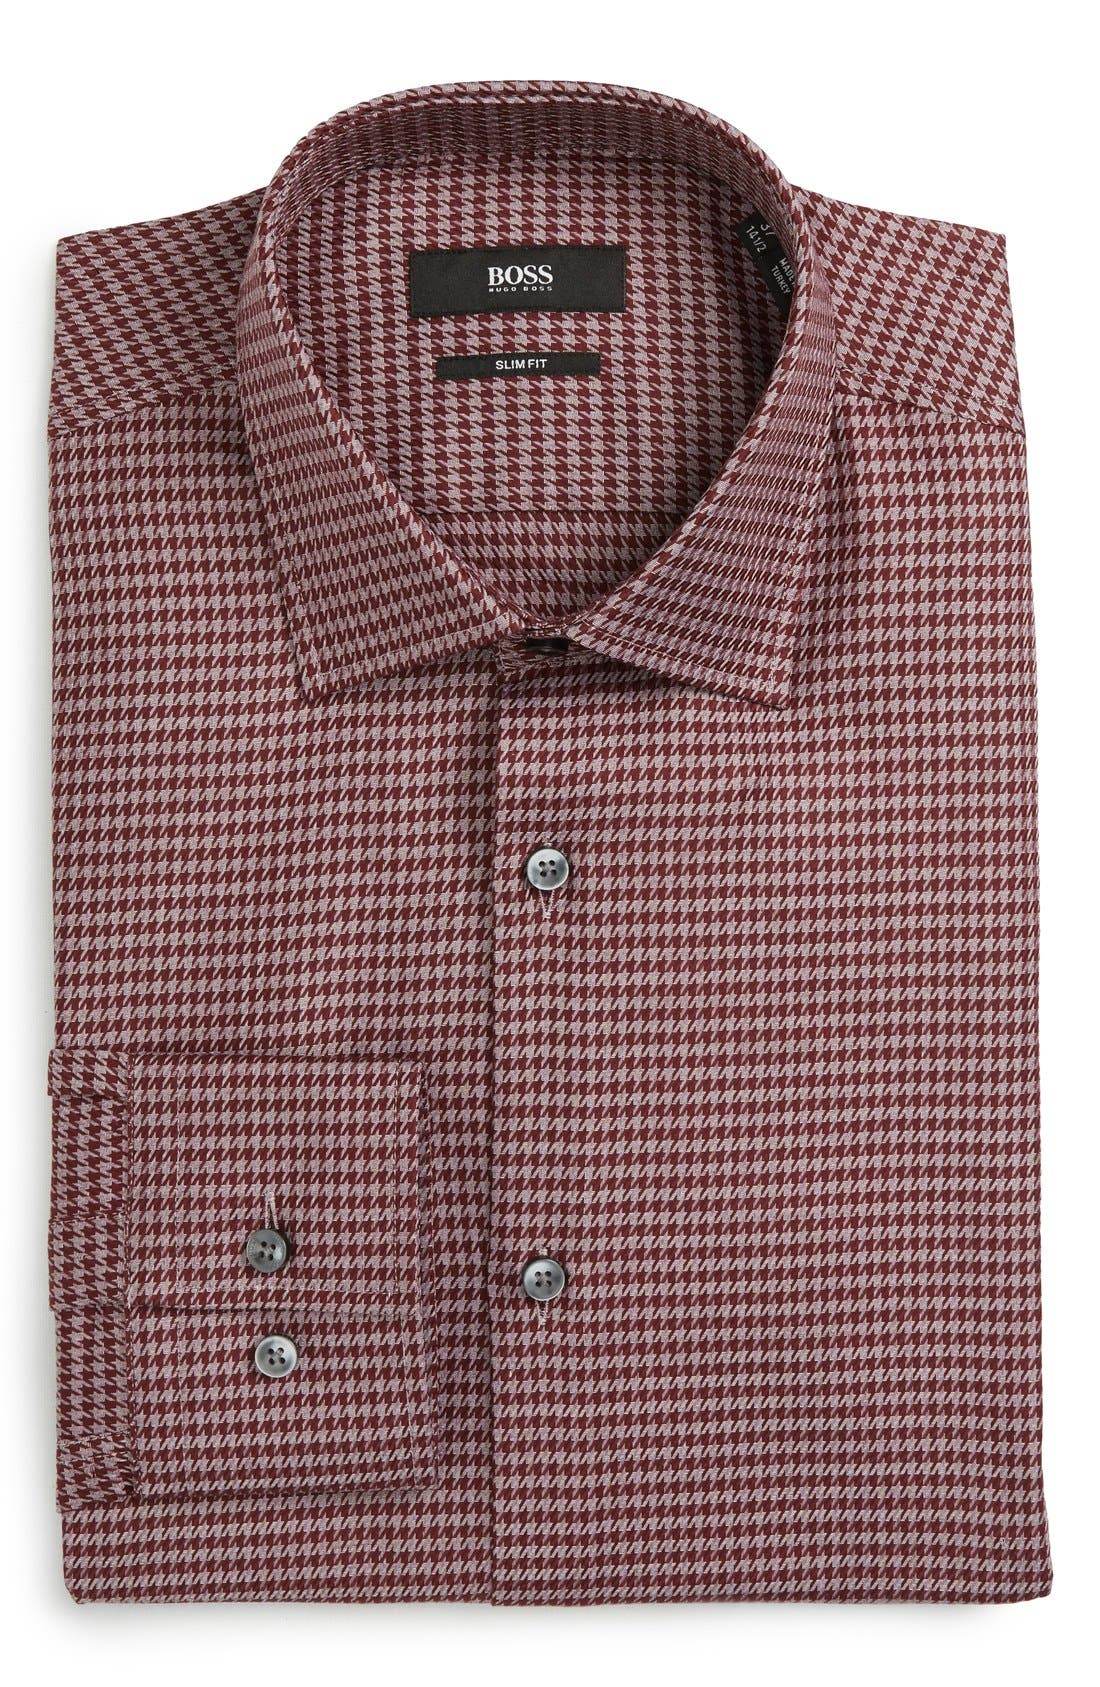 Main Image - BOSS Slim Fit Houndstooth Dress Shirt